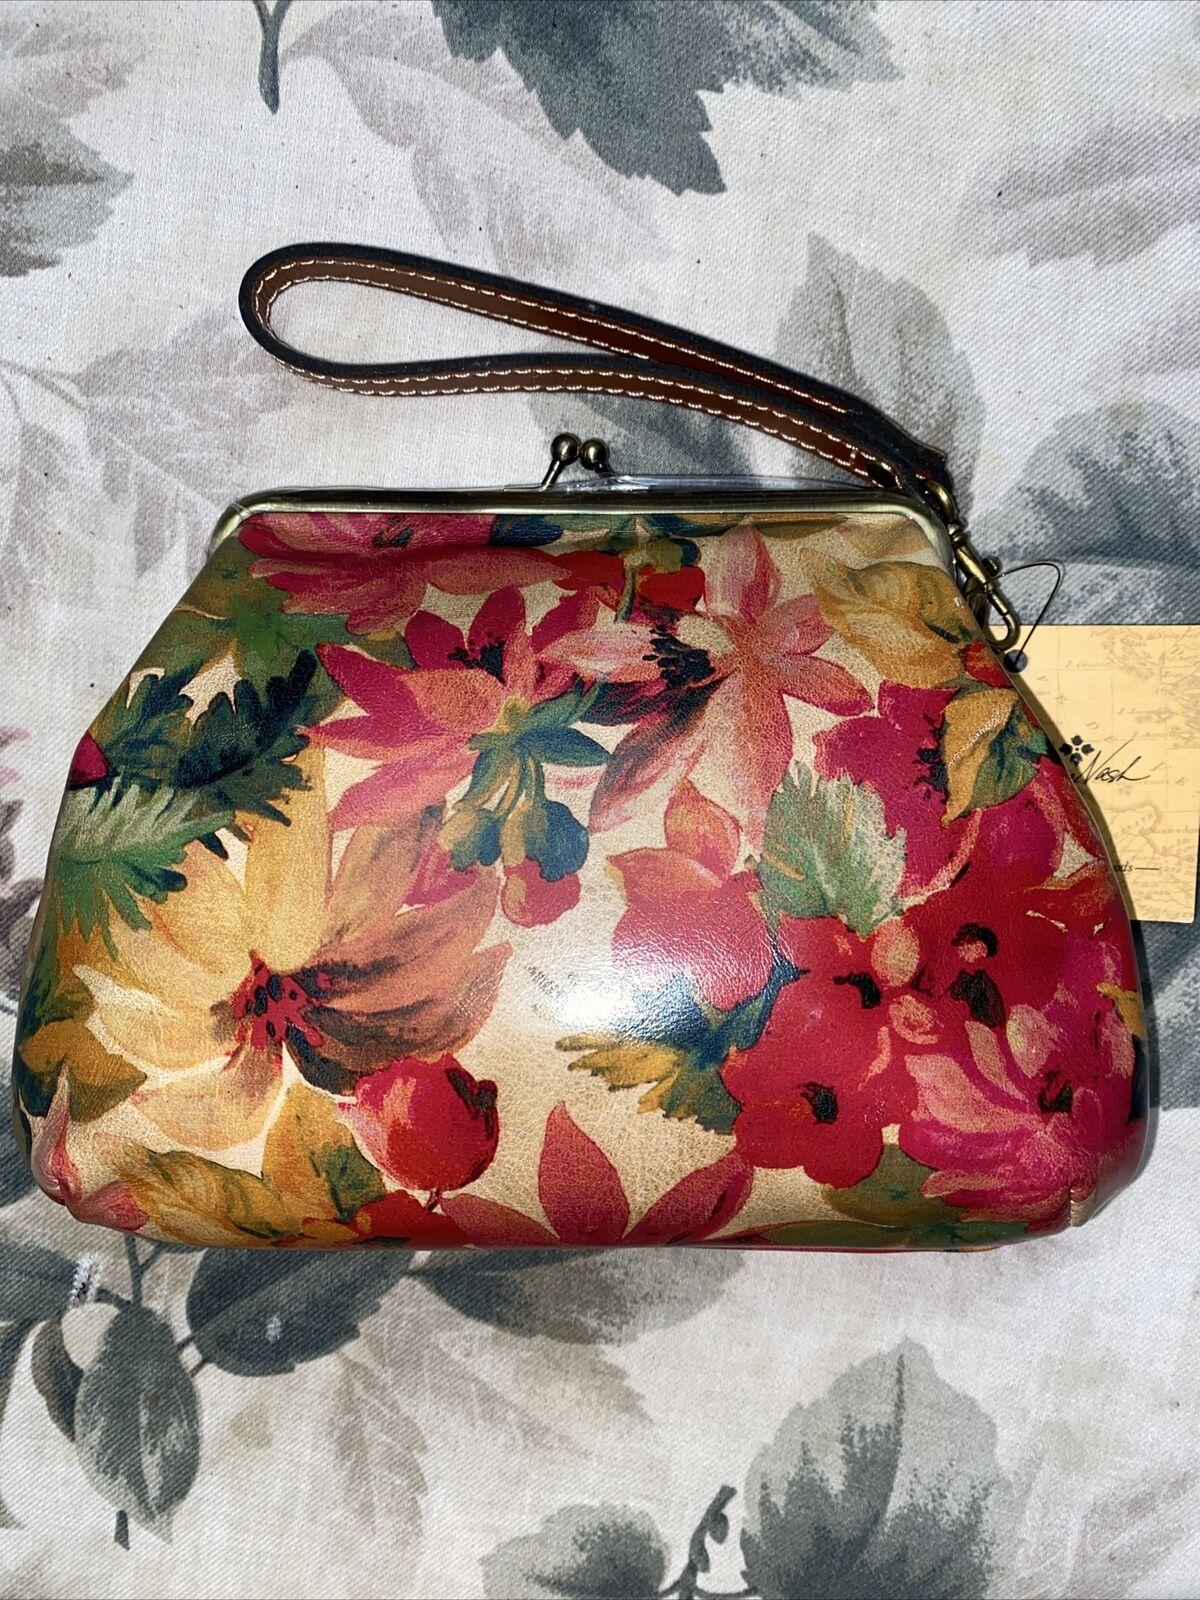 New Patricia Nash Floral Multi Color Savena Italian Leather Wristlet NEW CUTE